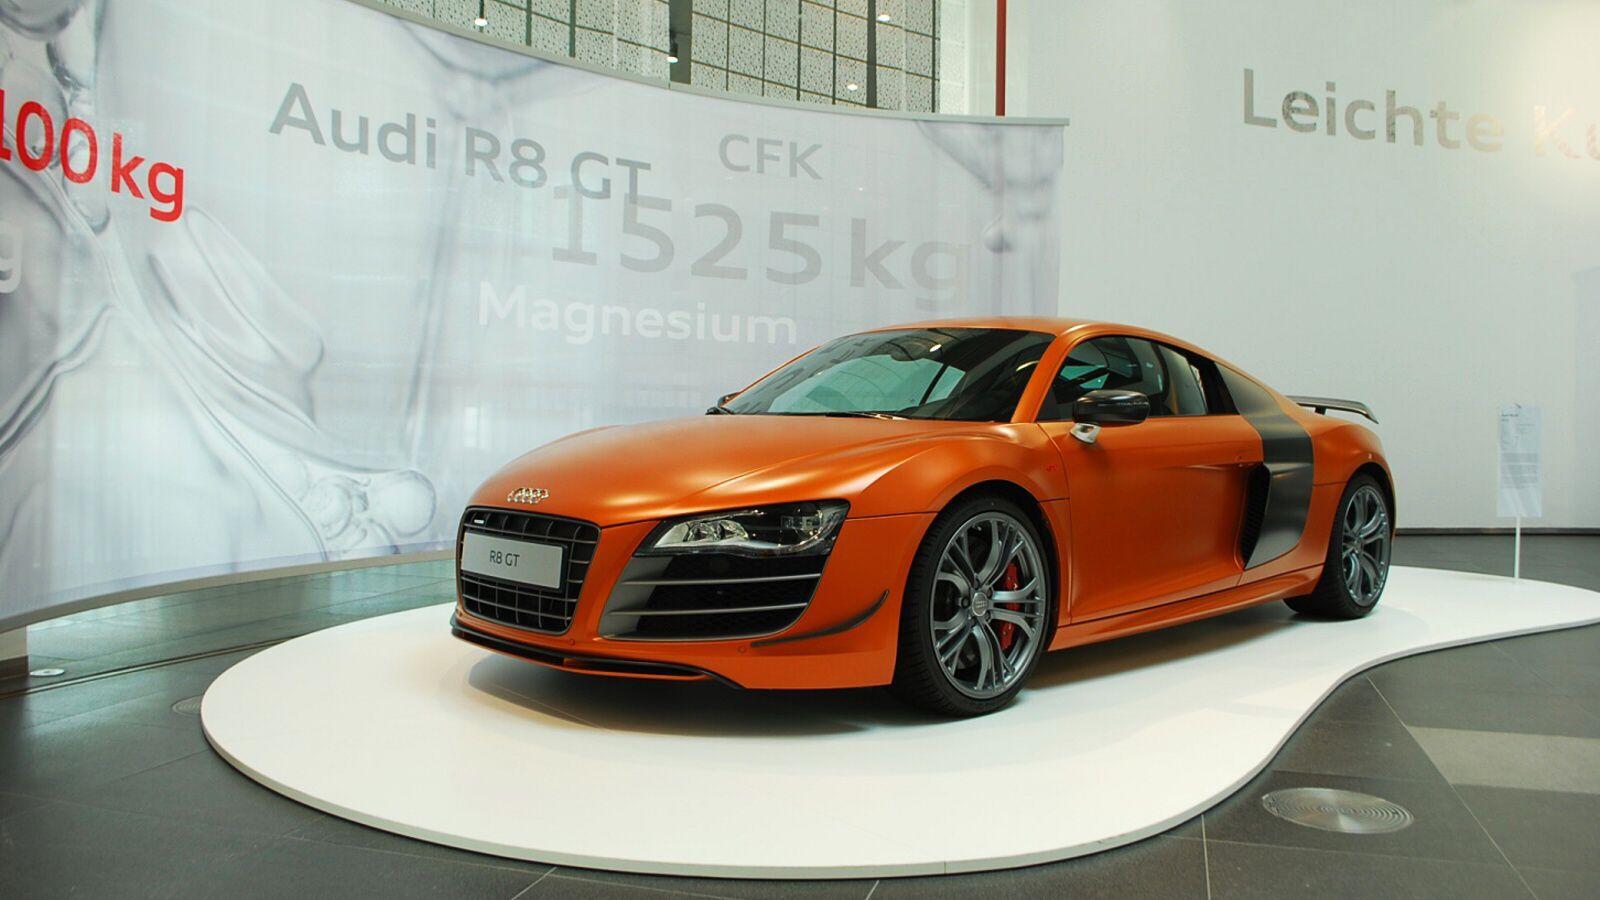 Audi R8 GT v oranžovo-hnědé barvě